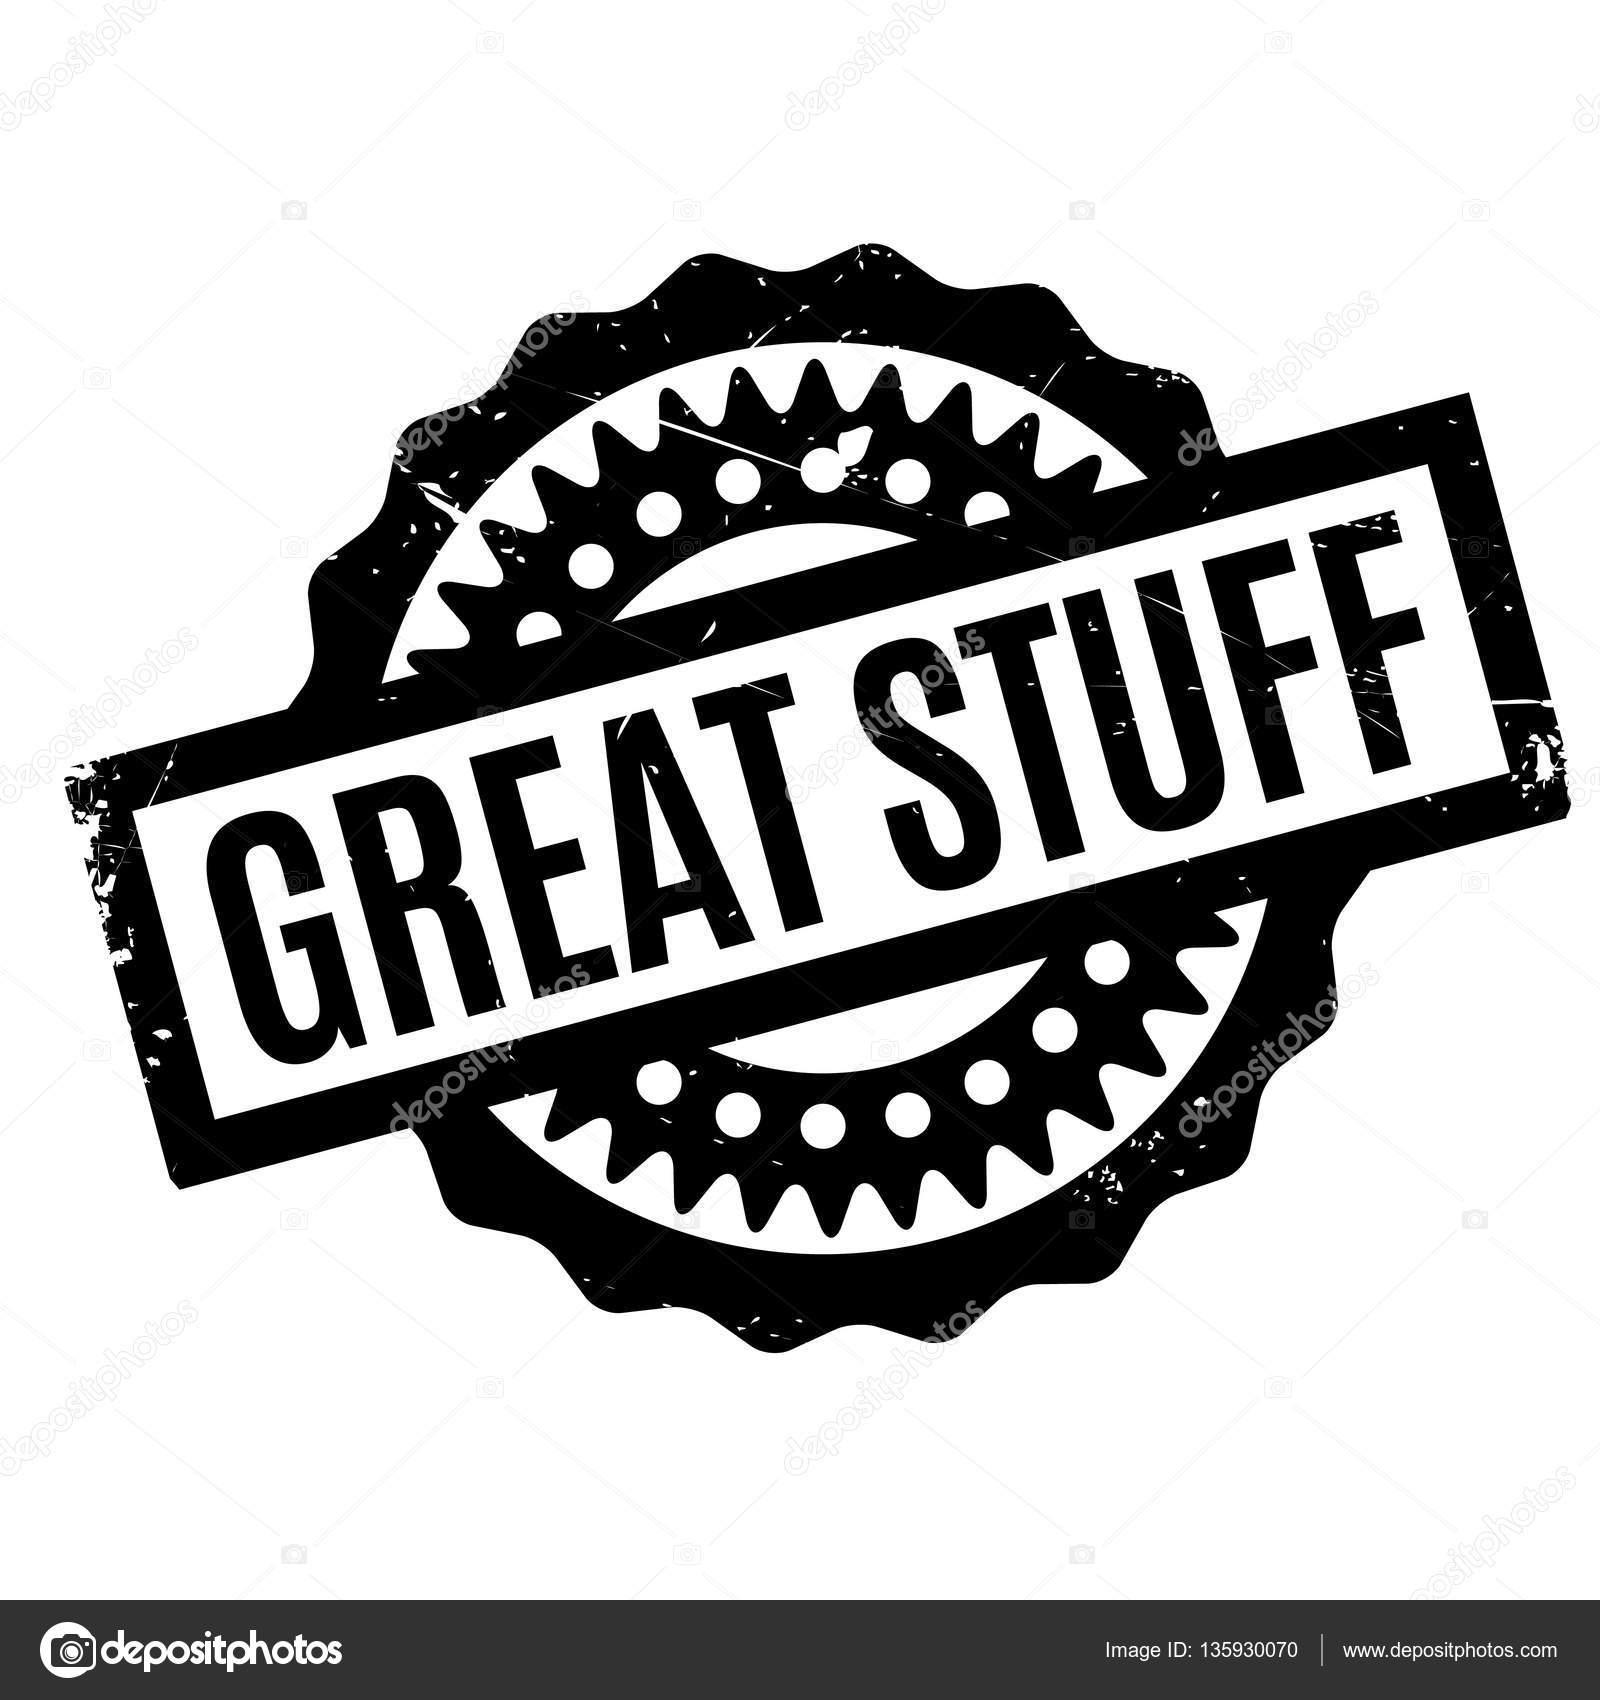 Great Stuff rubber stamp — Stock Vector © lkeskinen0 #135930070